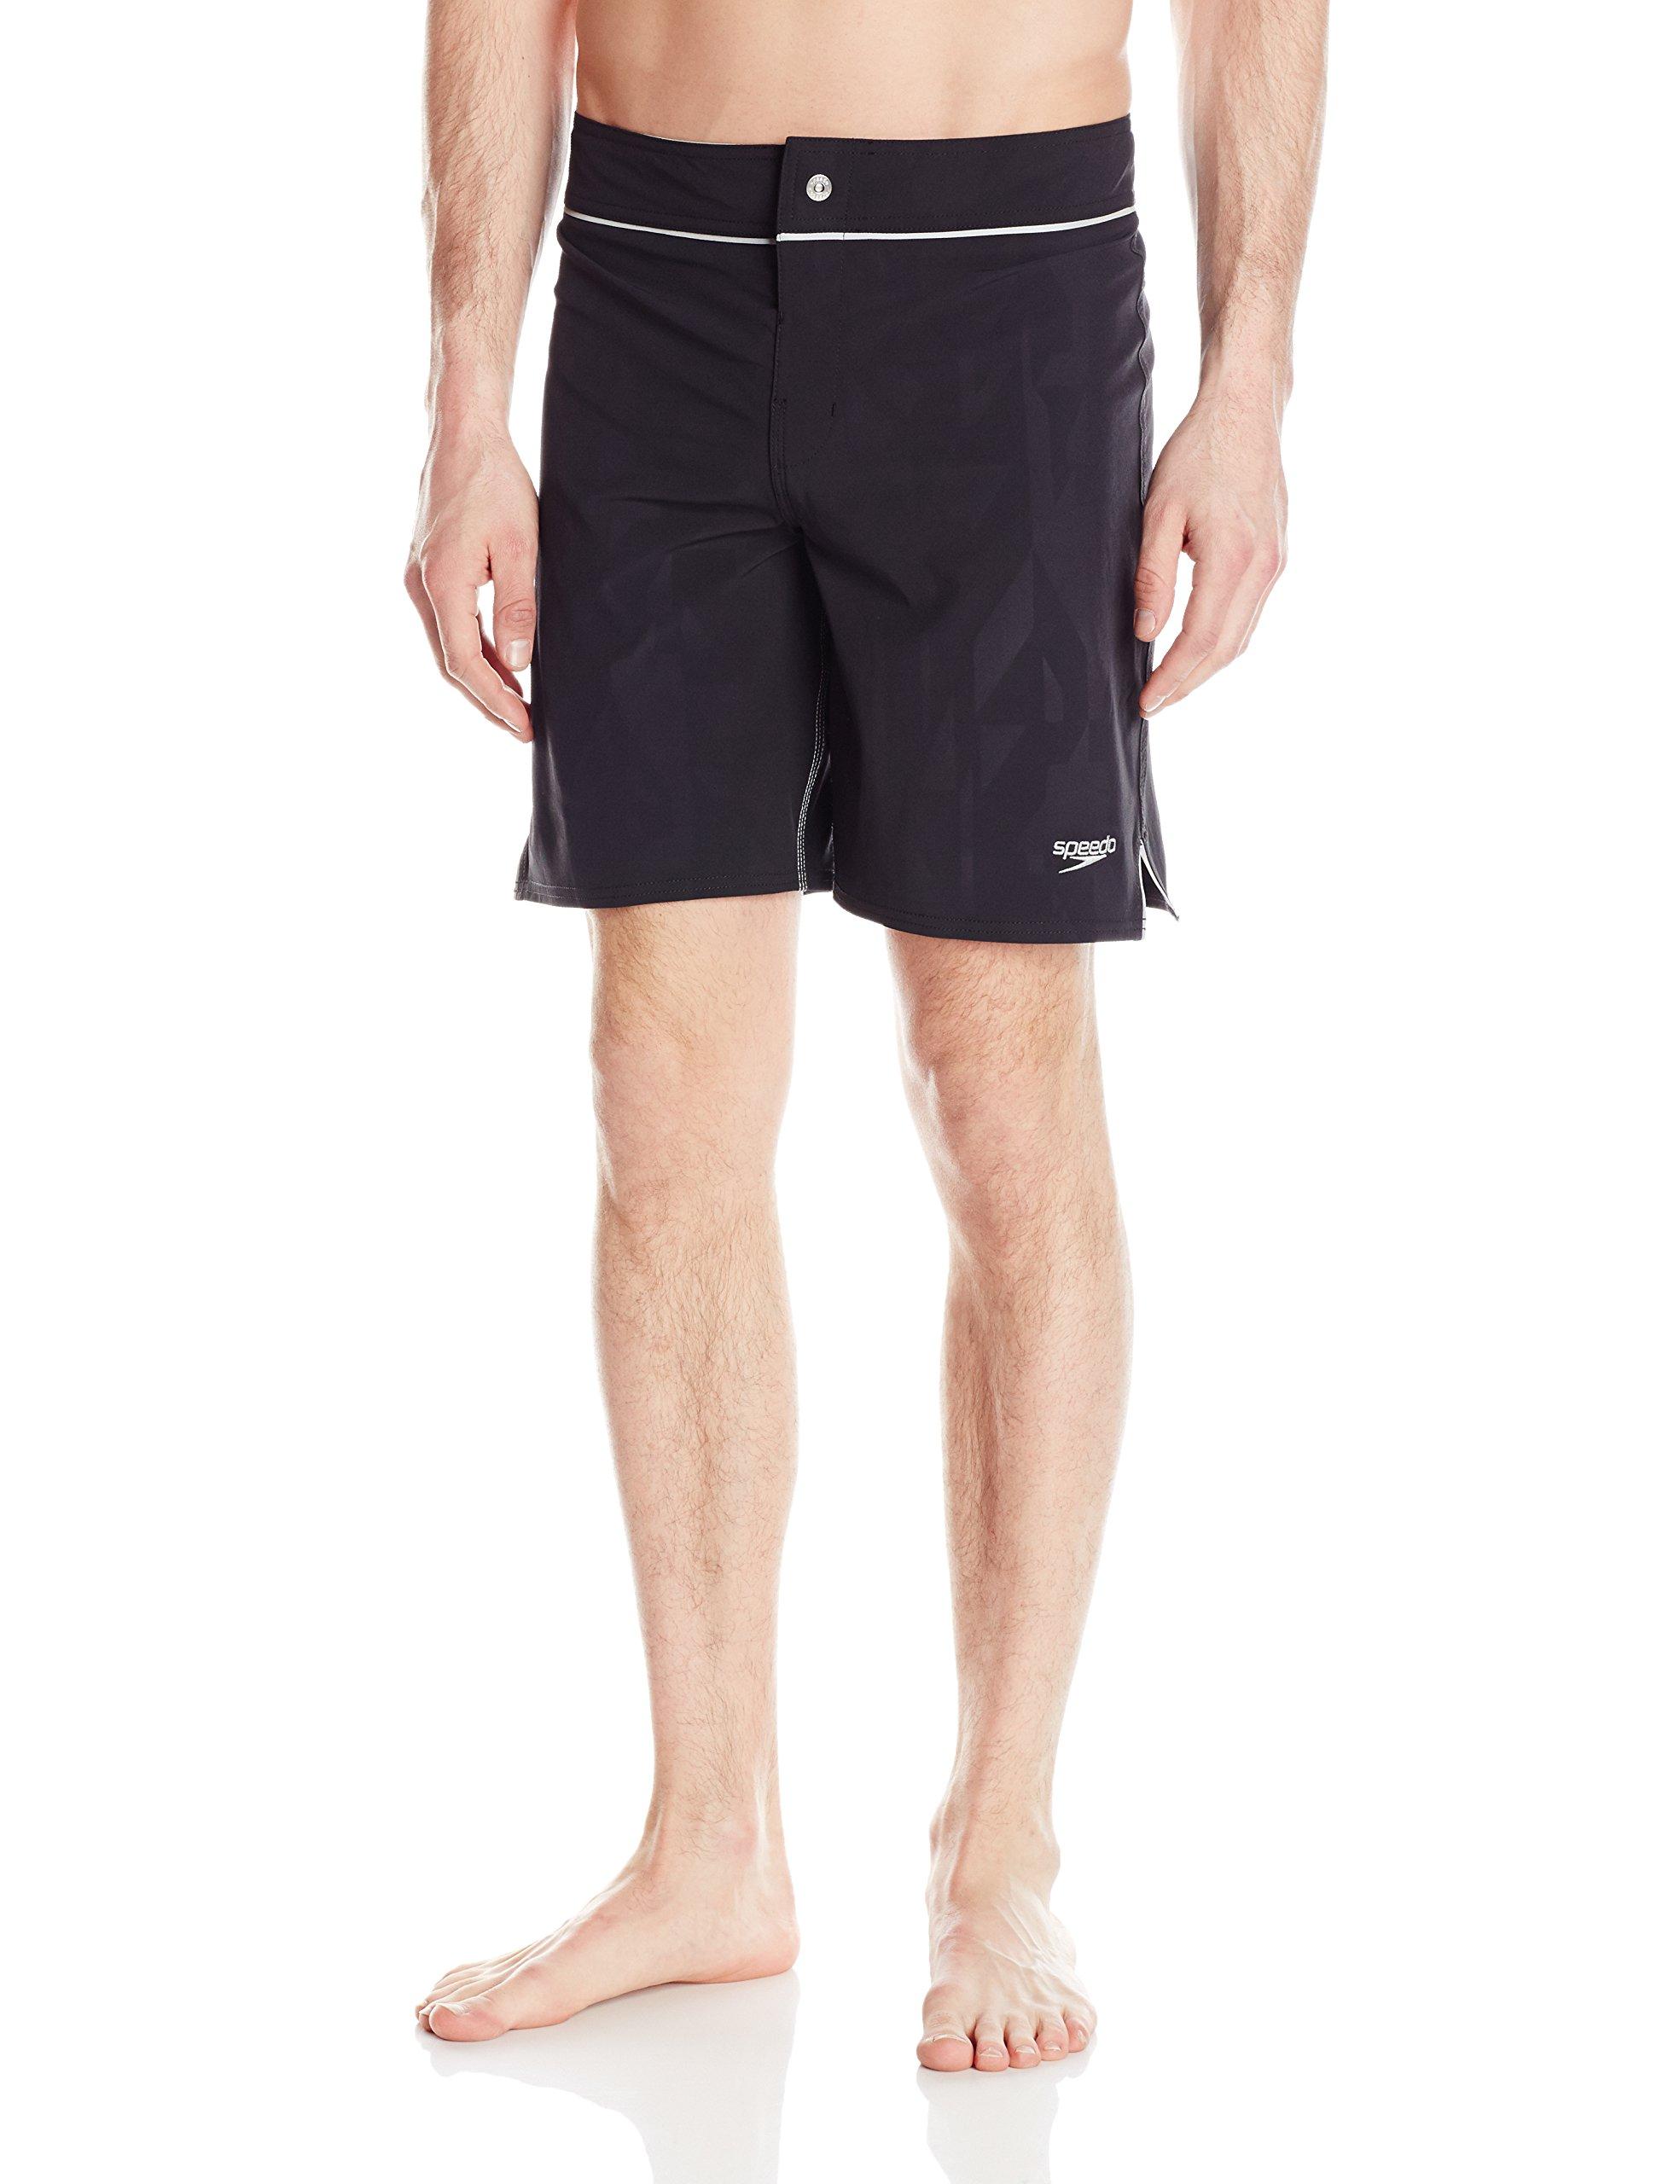 Speedo Men's Embossed Geo Packable Boardshort Workout & Swim Trunks, Black, Size 36